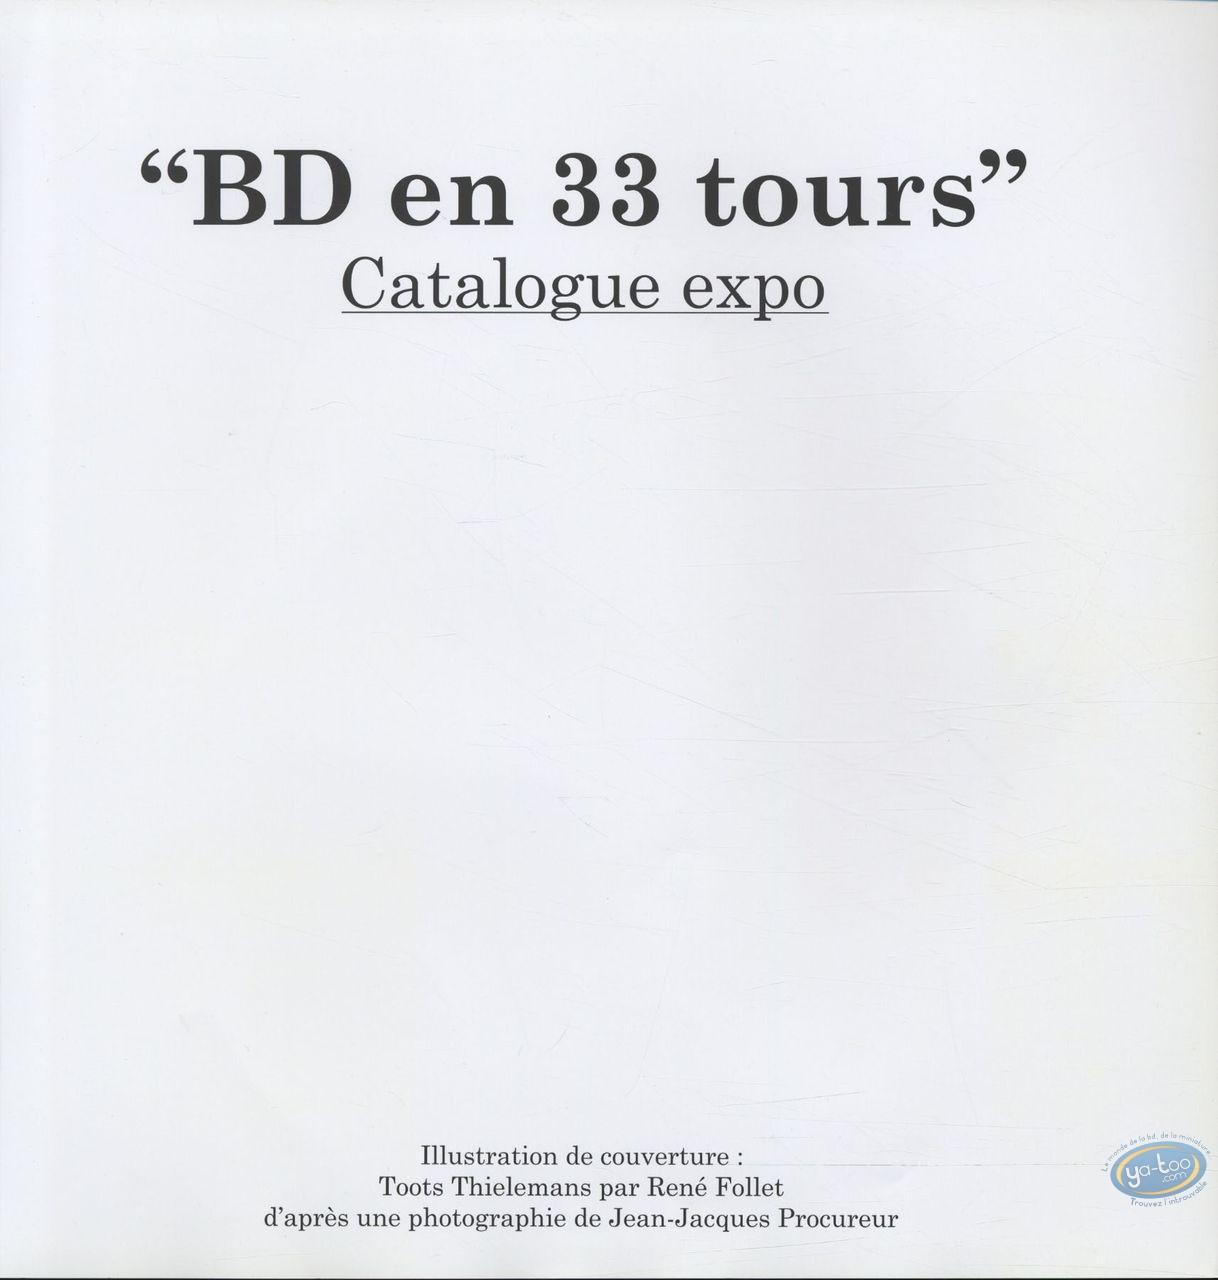 Reduced price European comic books, BD en 33 Tours : BD en 33 tours + ex-libris Dany + ex-libris Reculé aquarellé